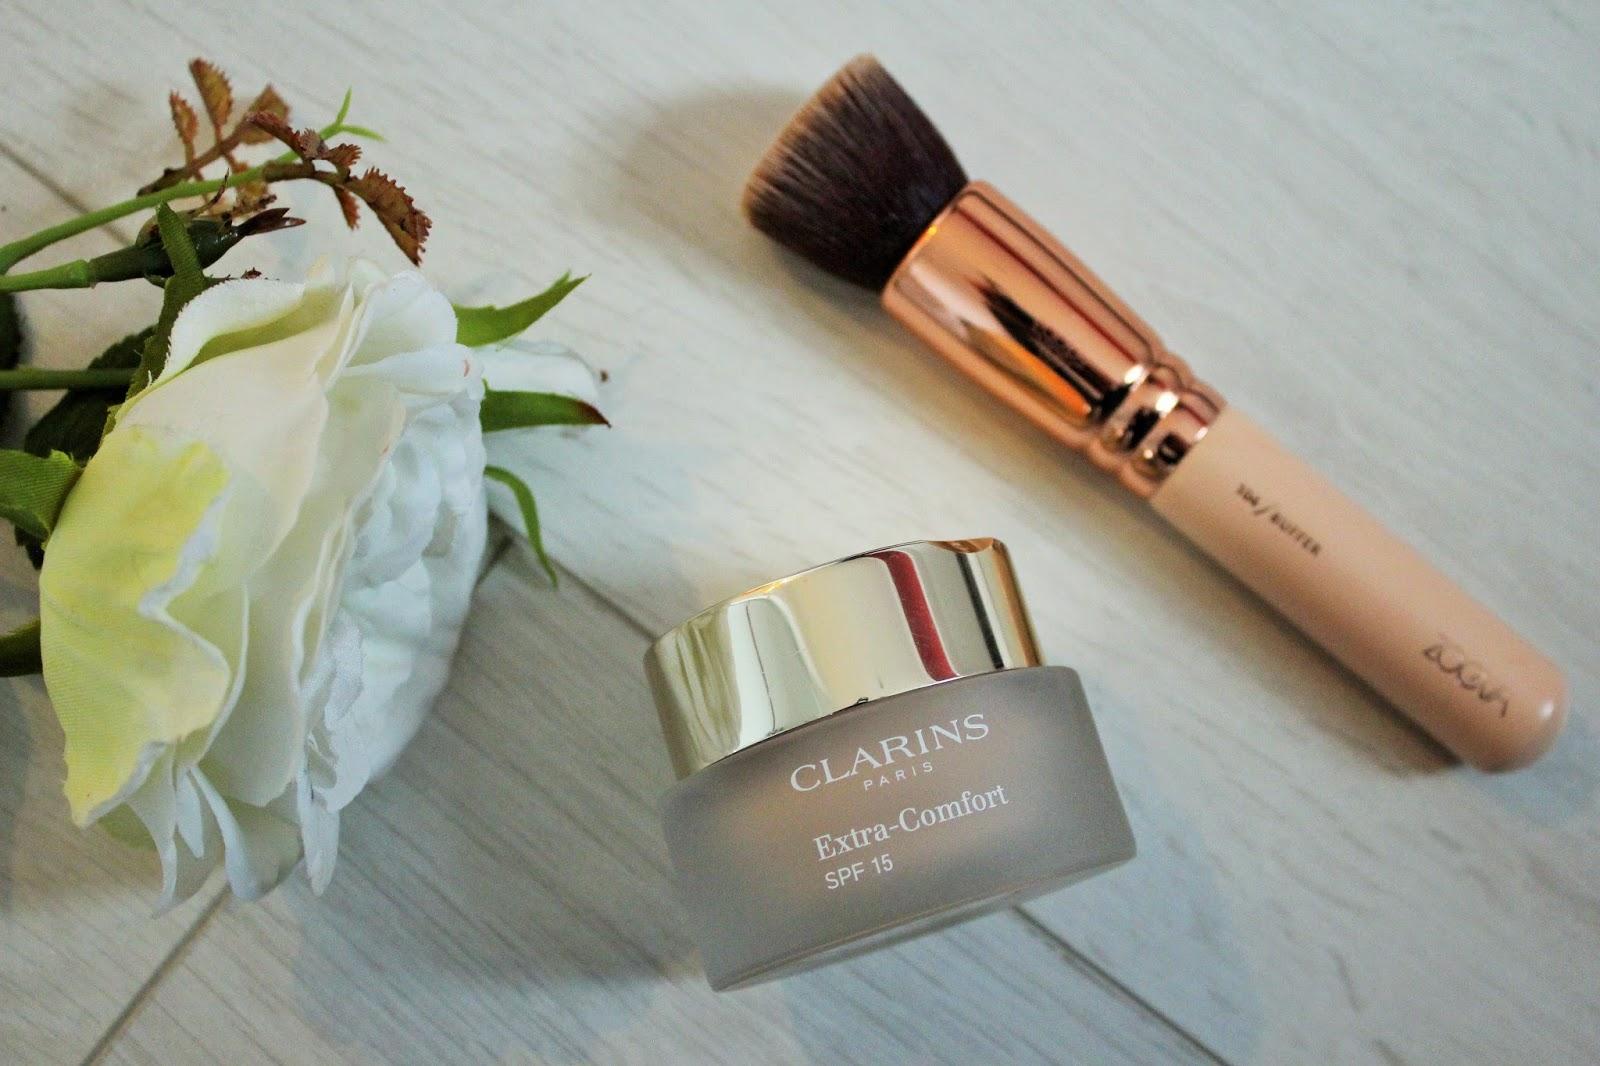 February Favourites 2017 - 6 - Clarins Extra Comfort Foundation and Zoeva Buffer Brush